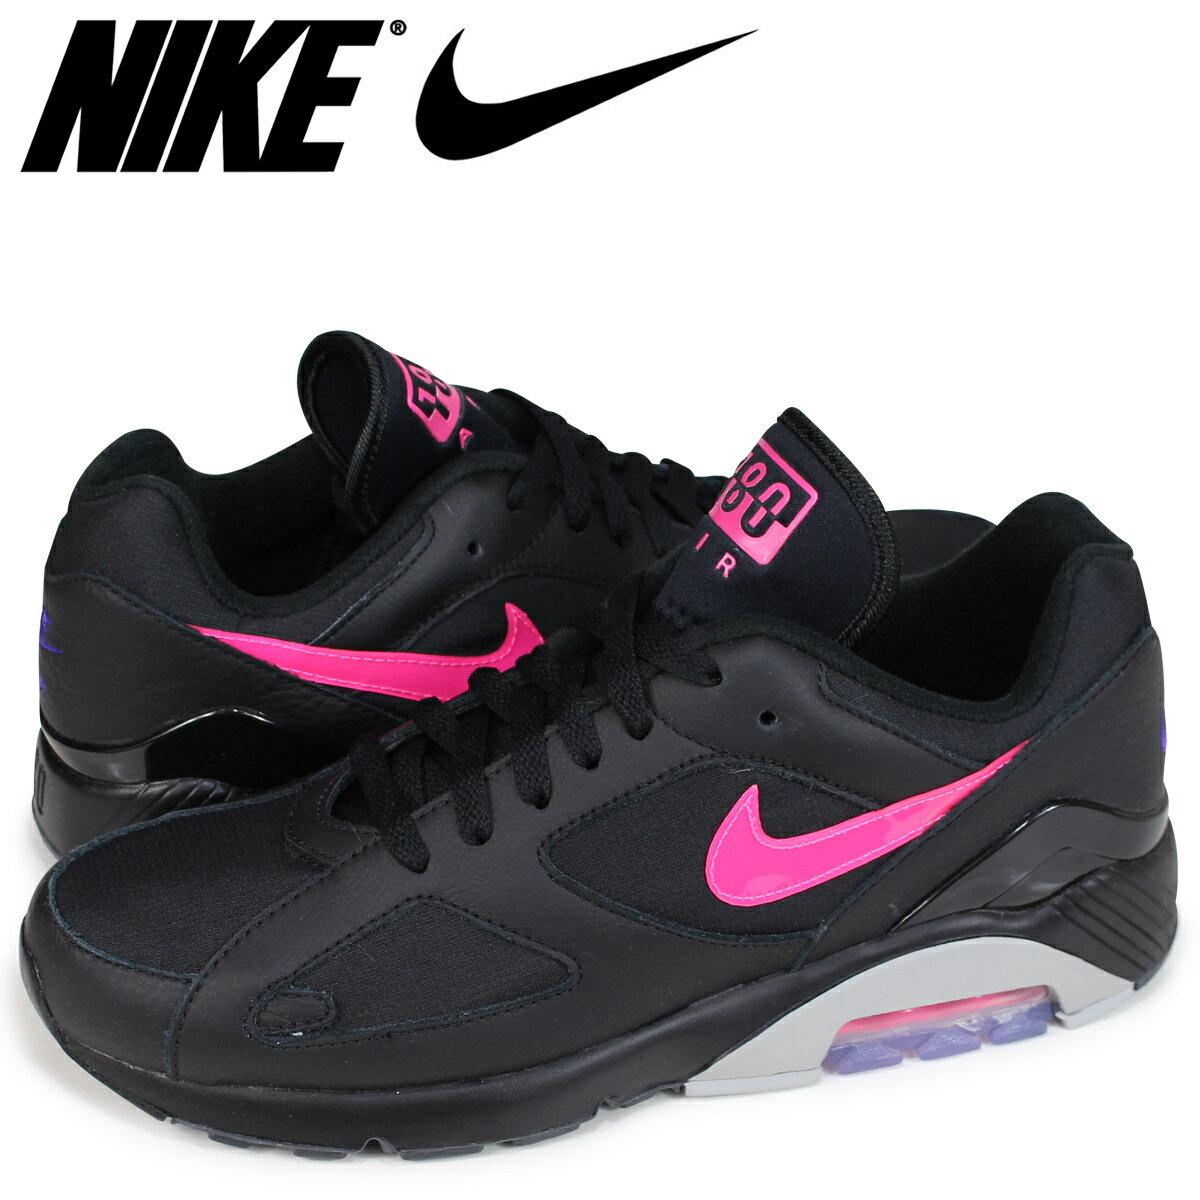 sports shoes e2376 19f9e NIKE AIR MAX 180 Kie Ney AMAX 180 sneakers men AQ9974-001 black